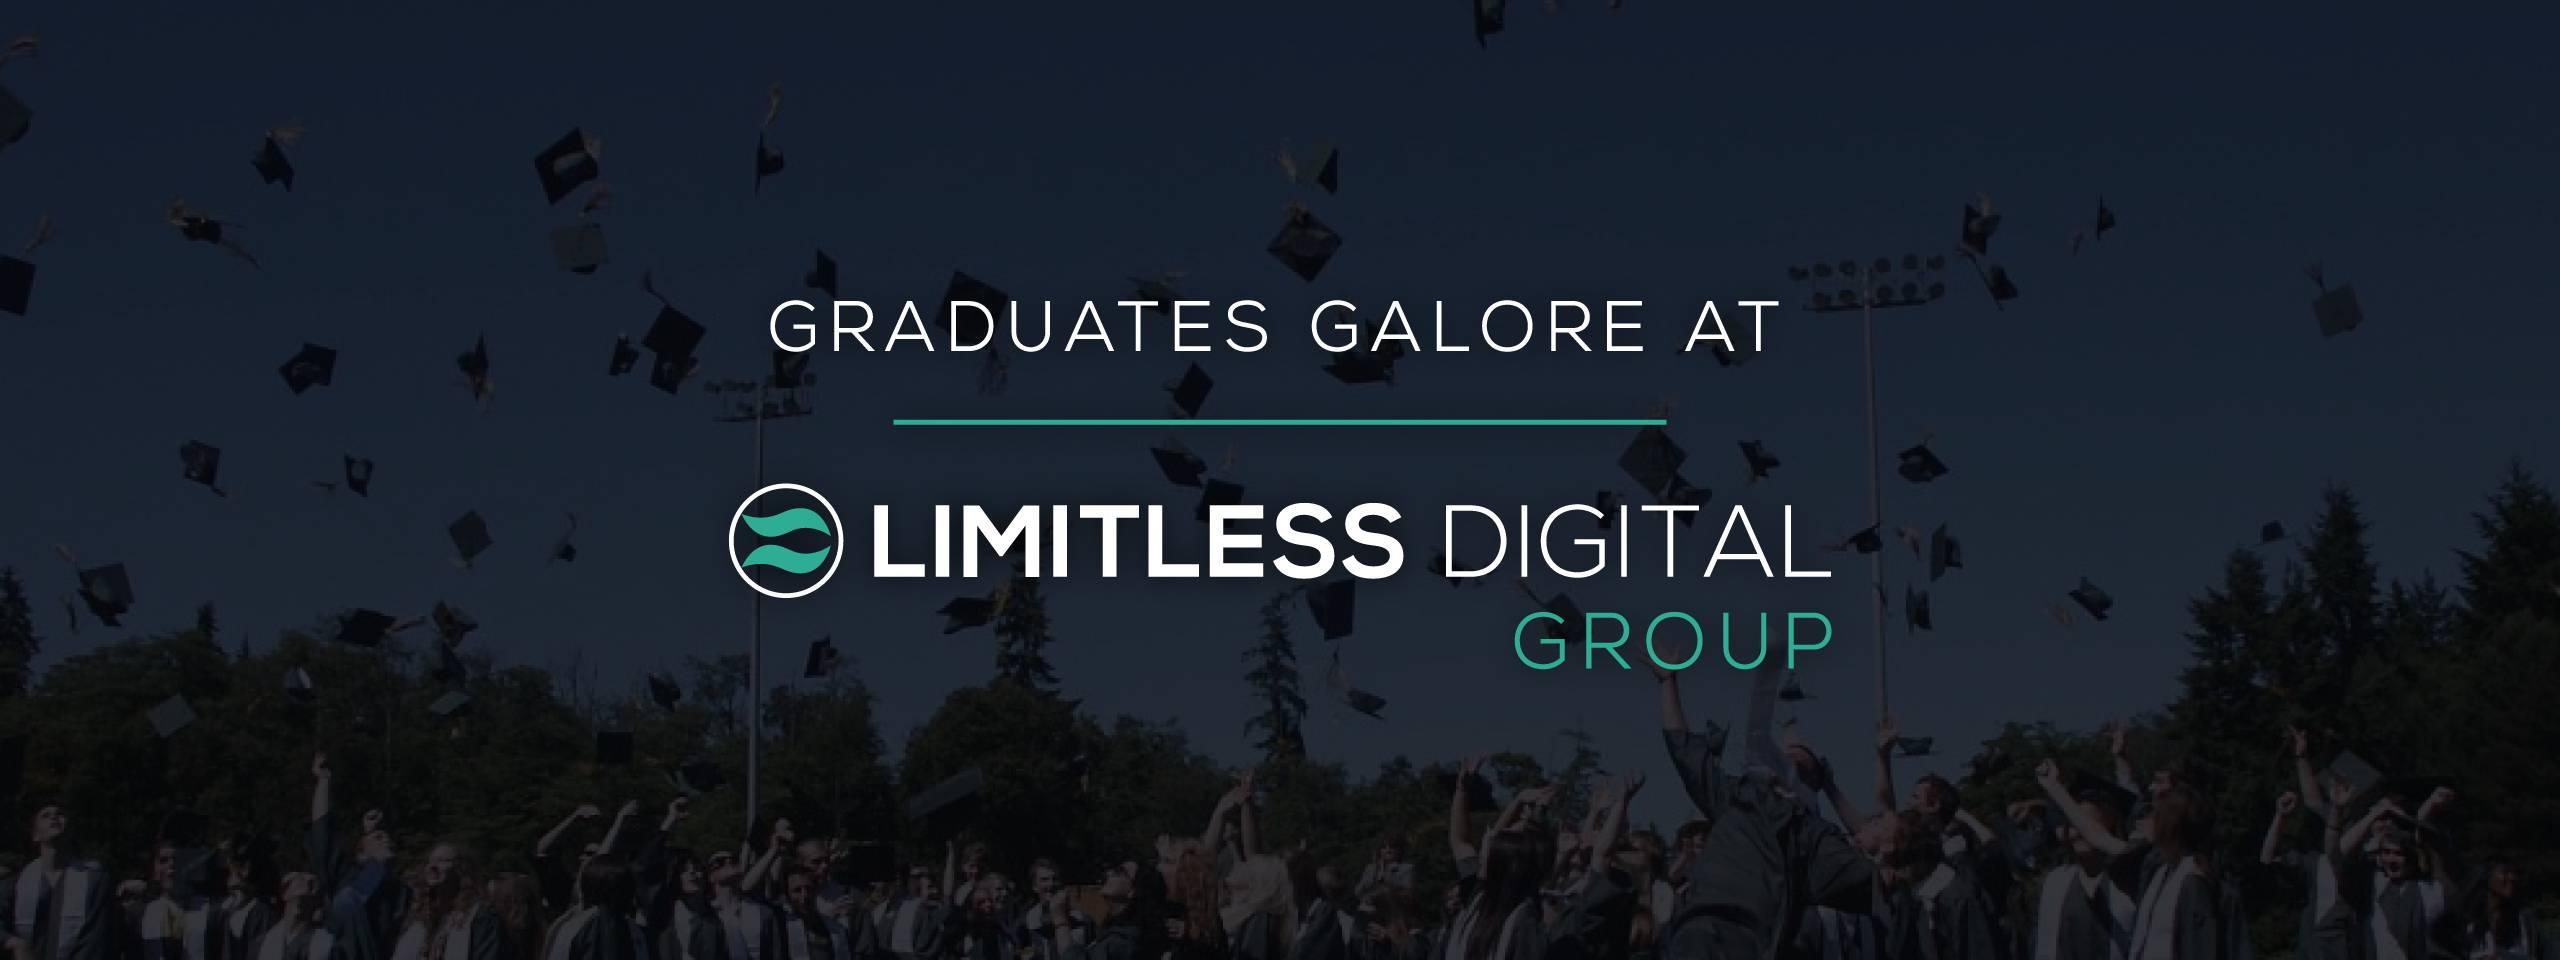 graduates galore blog header image